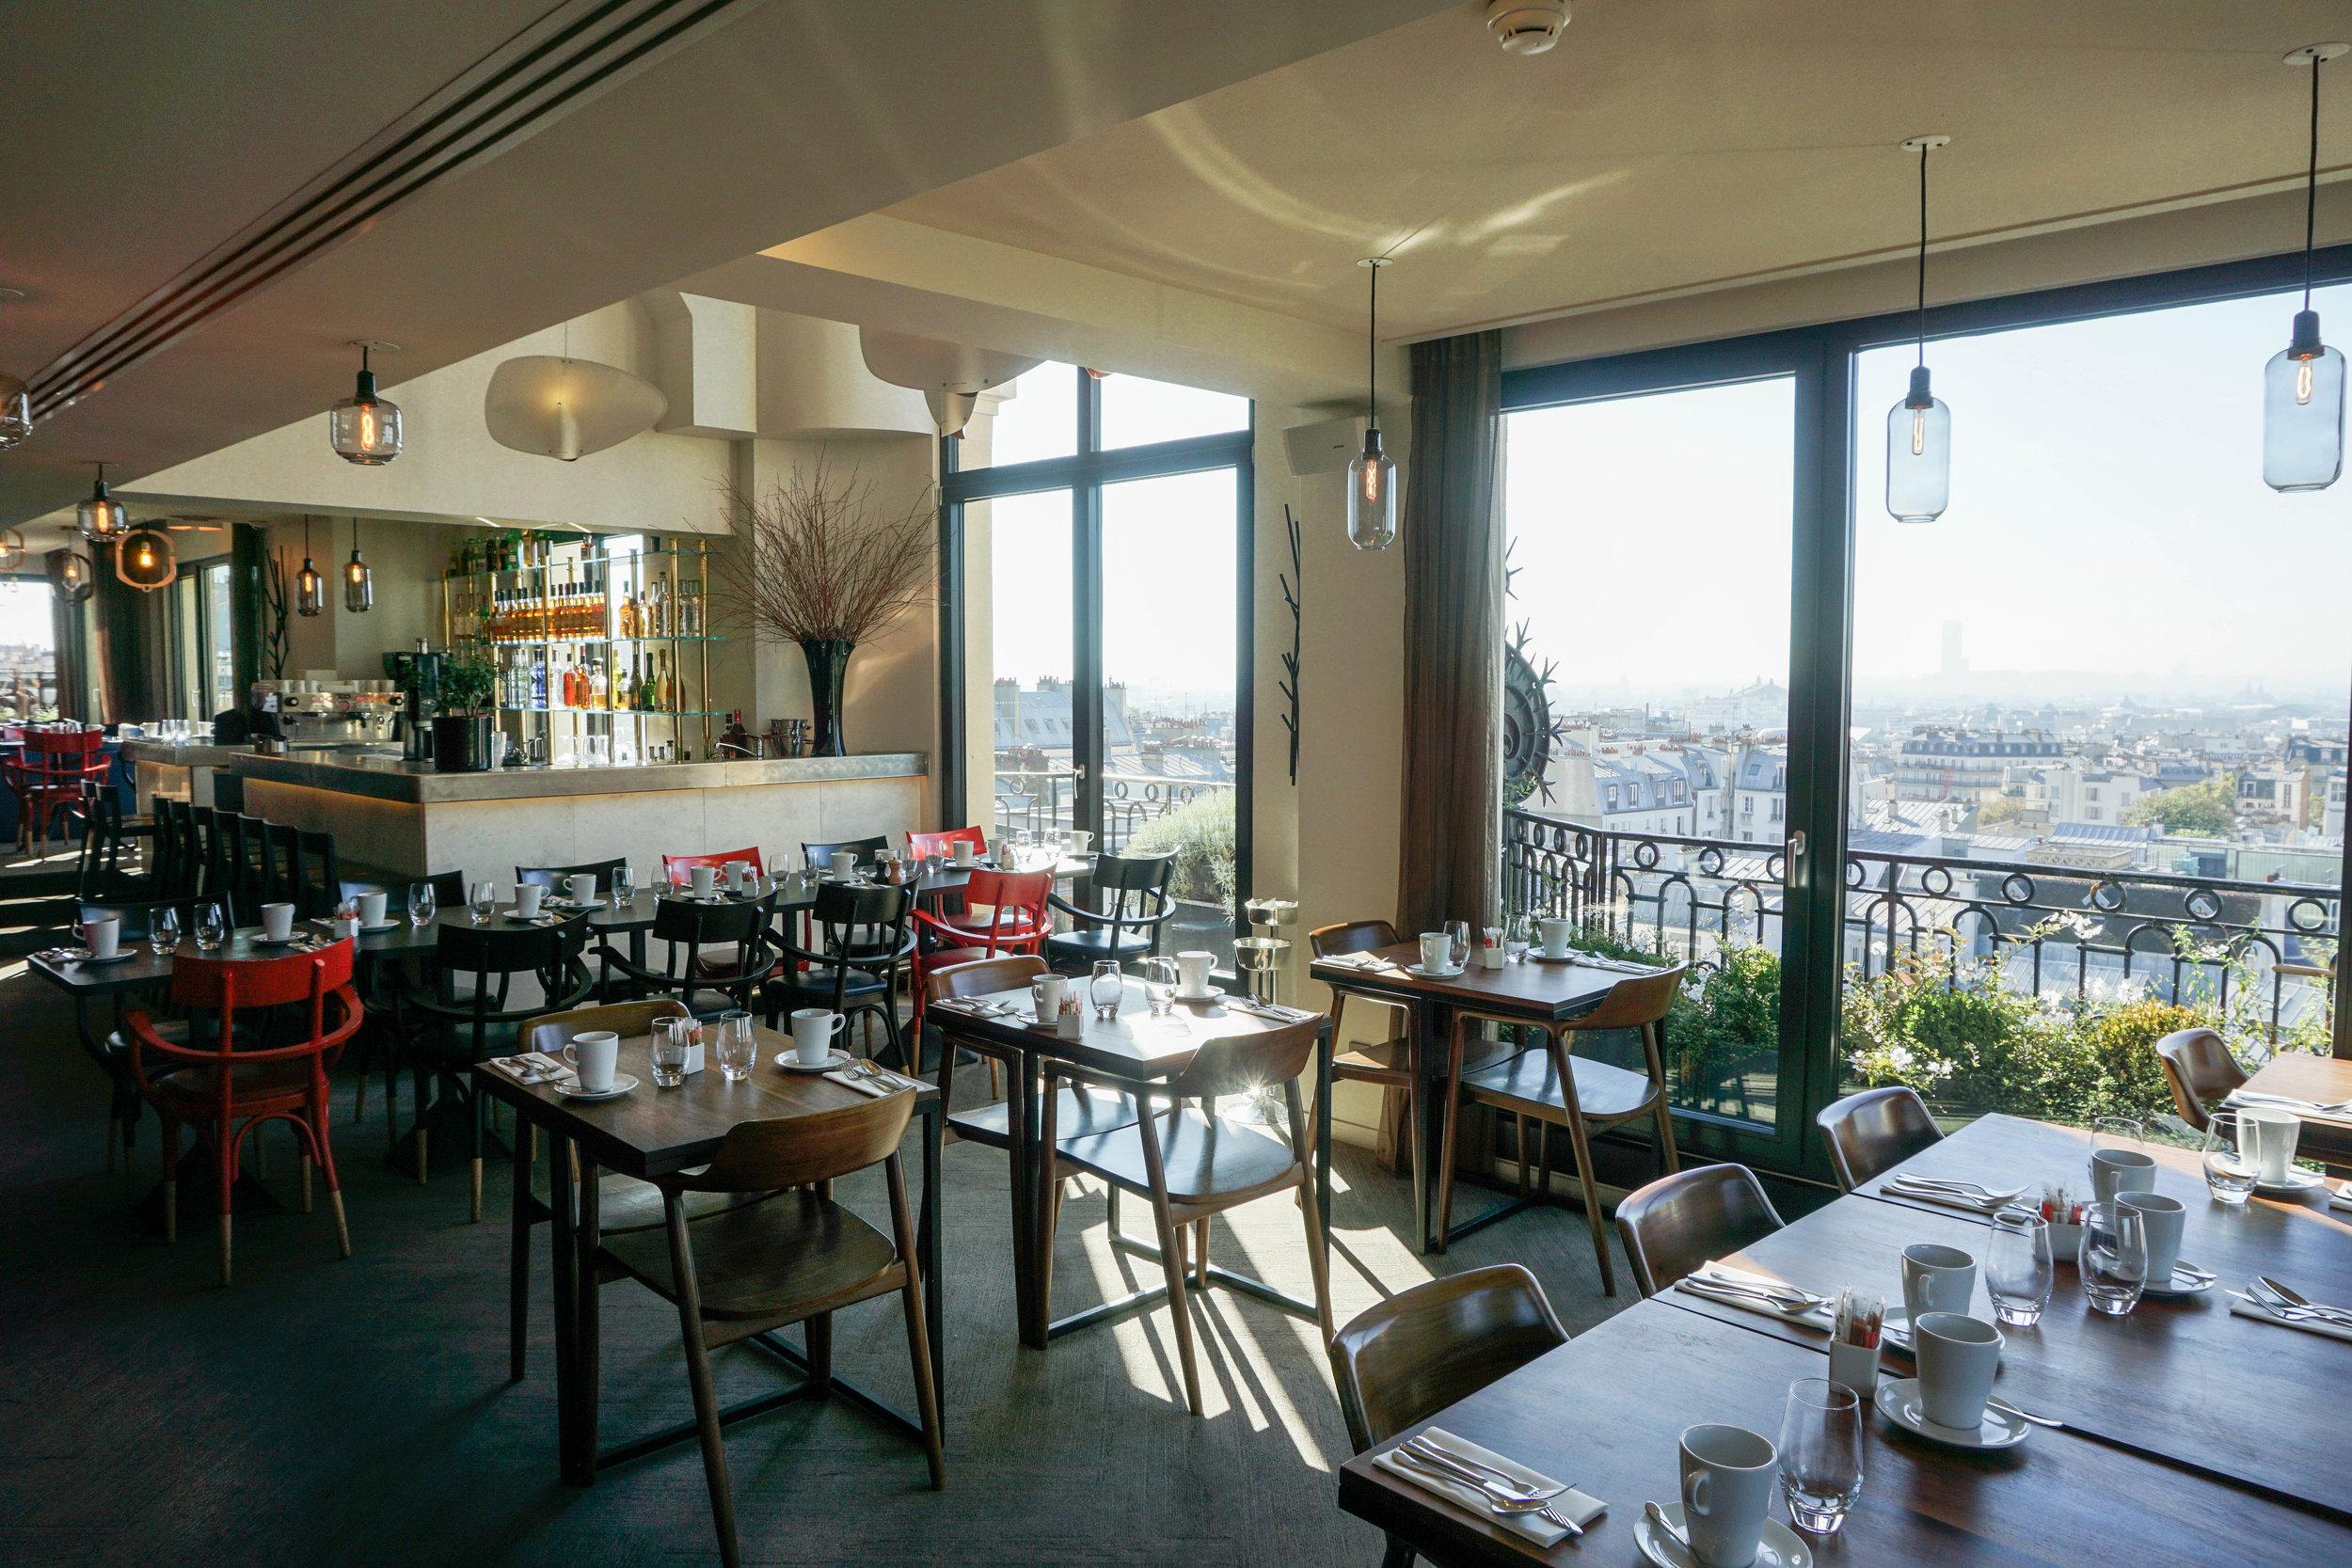 Paris-Terrass Hotel-restaurant